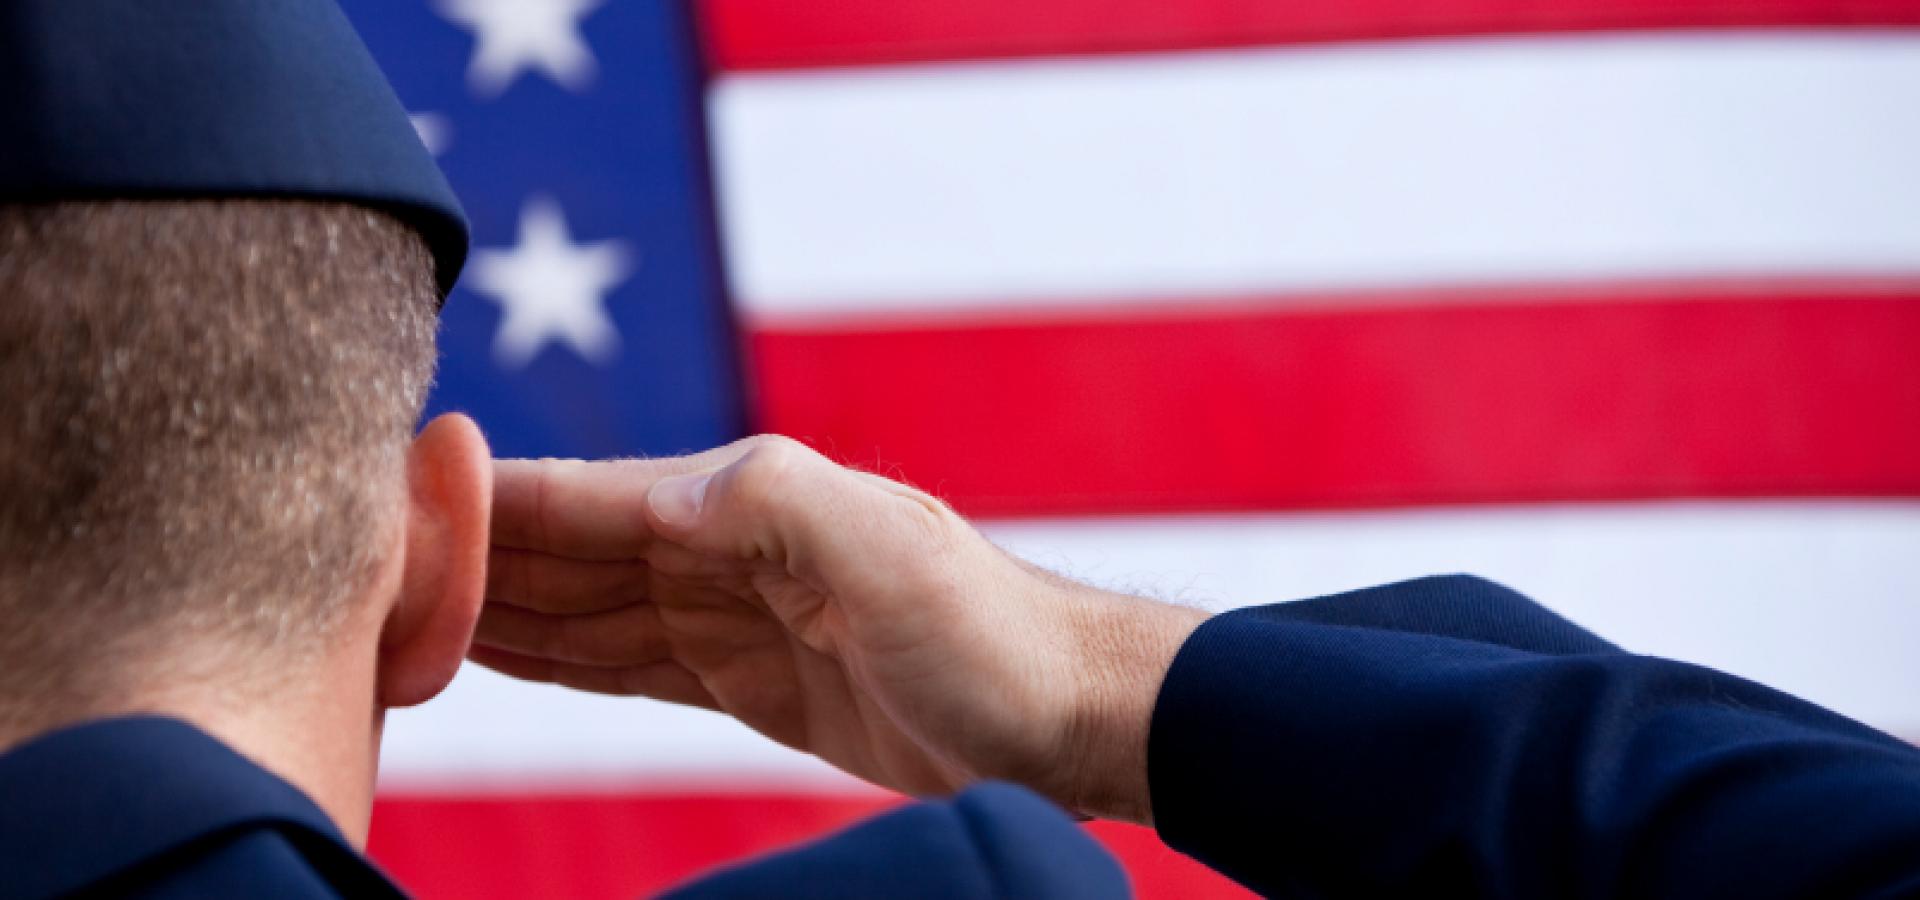 Veterans Day: President Ronald Reagan's words